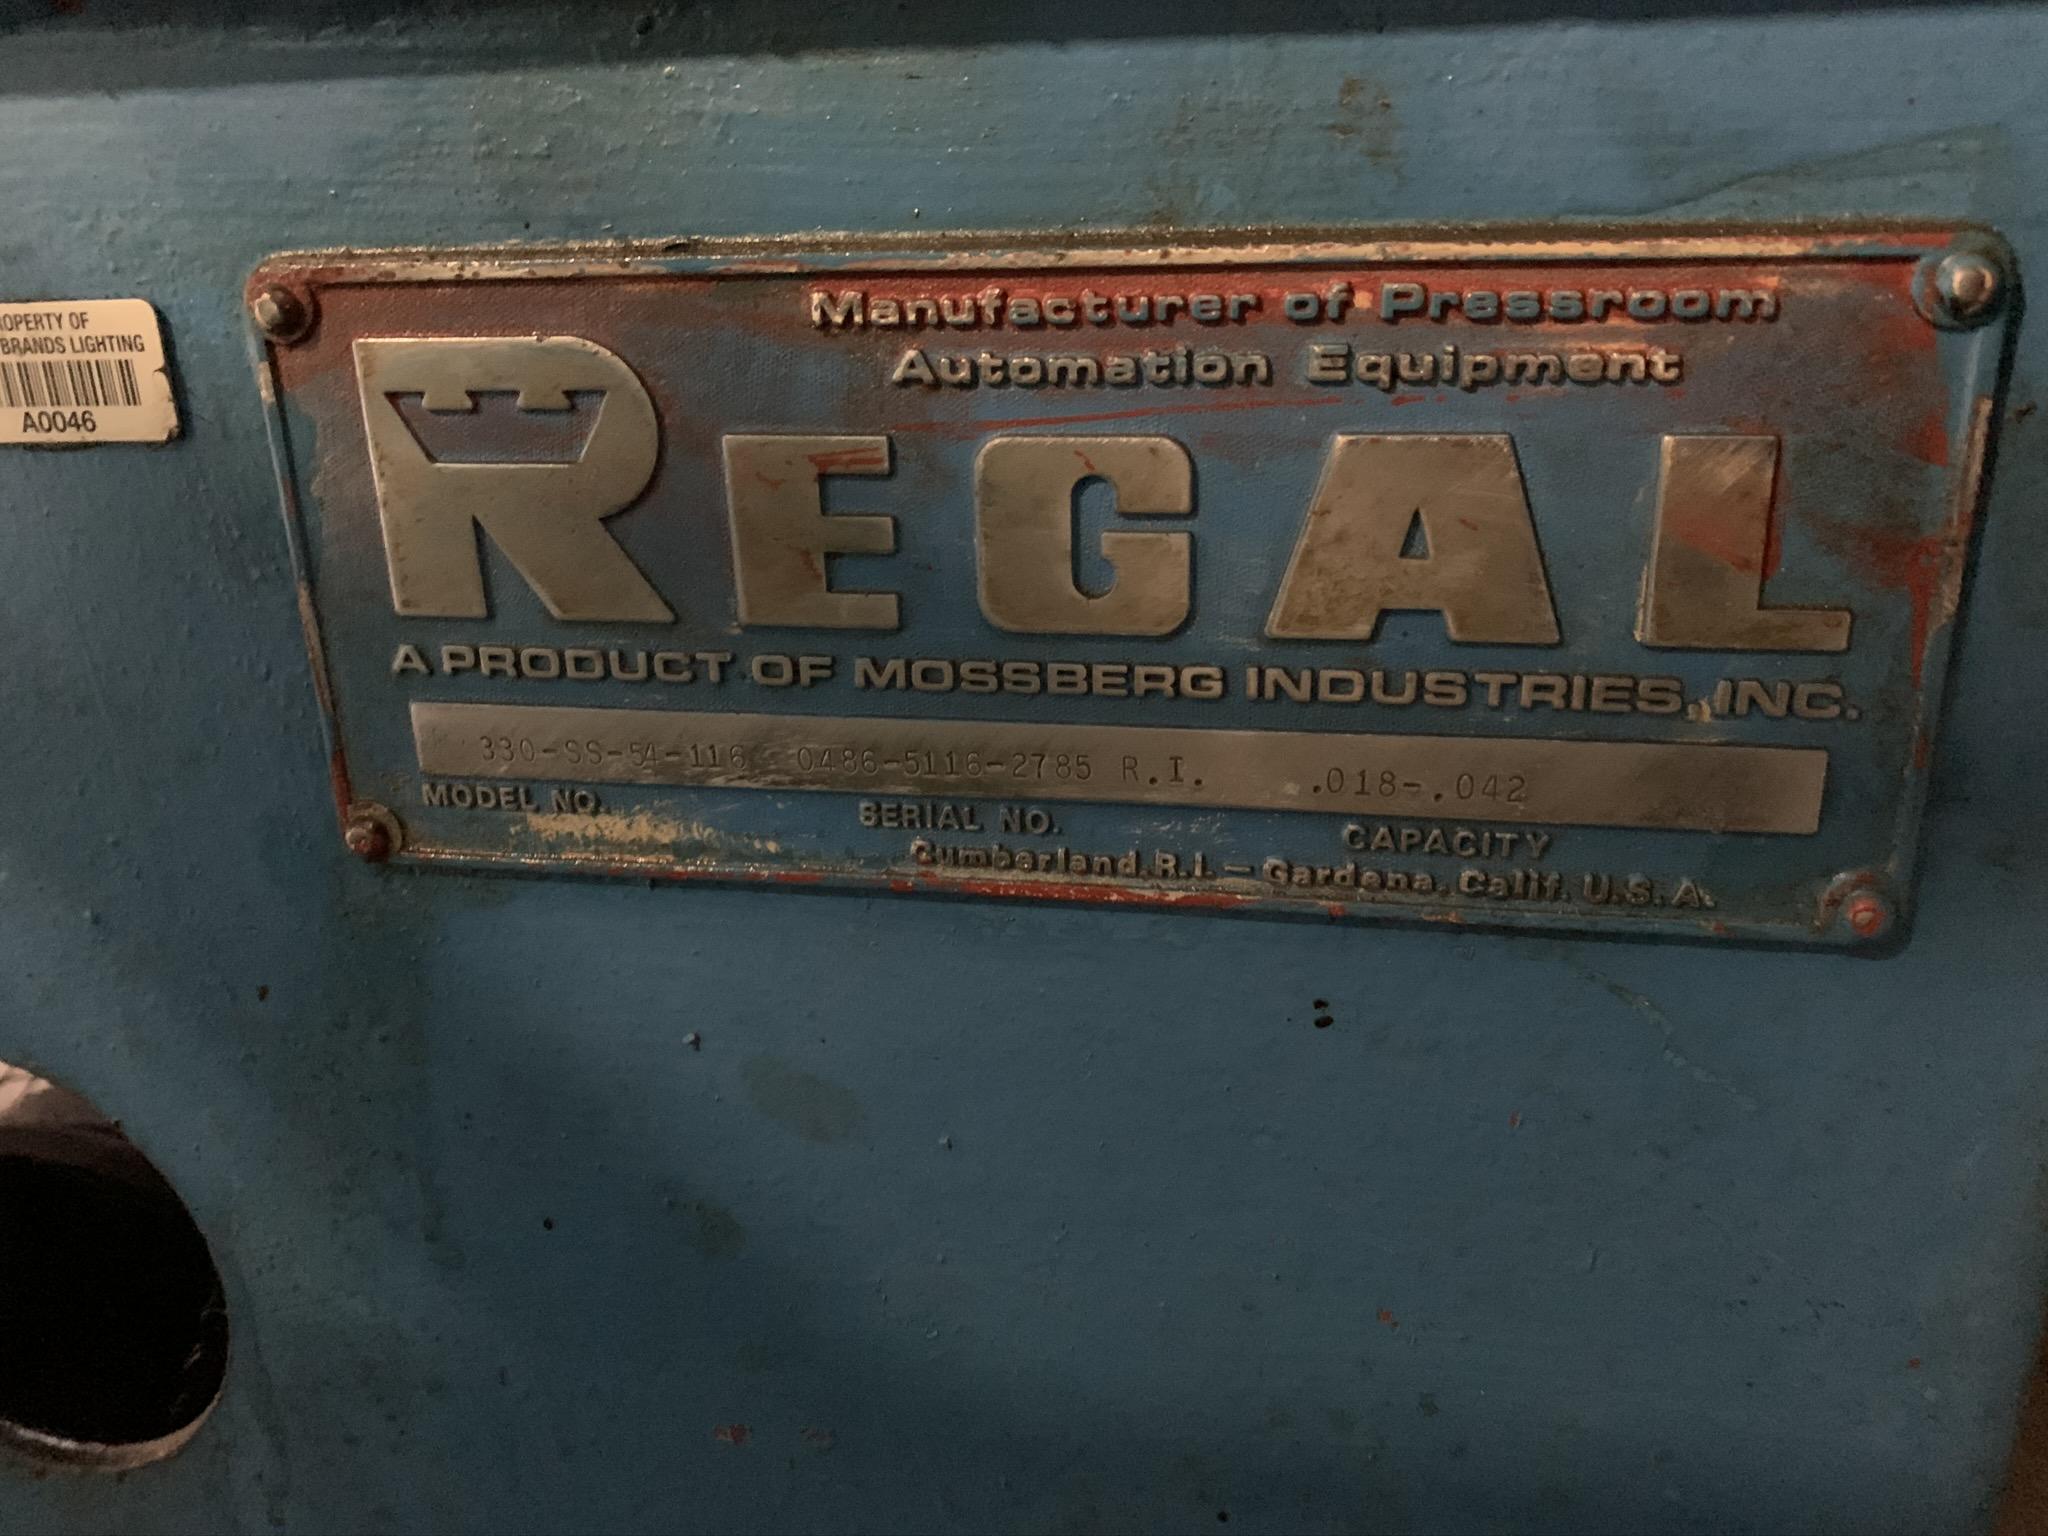 "54"" REGAL MODEL 330-SS-54-116 POWERED STRAIGHTENER; S/N 048651162783RI, 54"" MAX WIDTH, .018 TO . - Image 5 of 5"